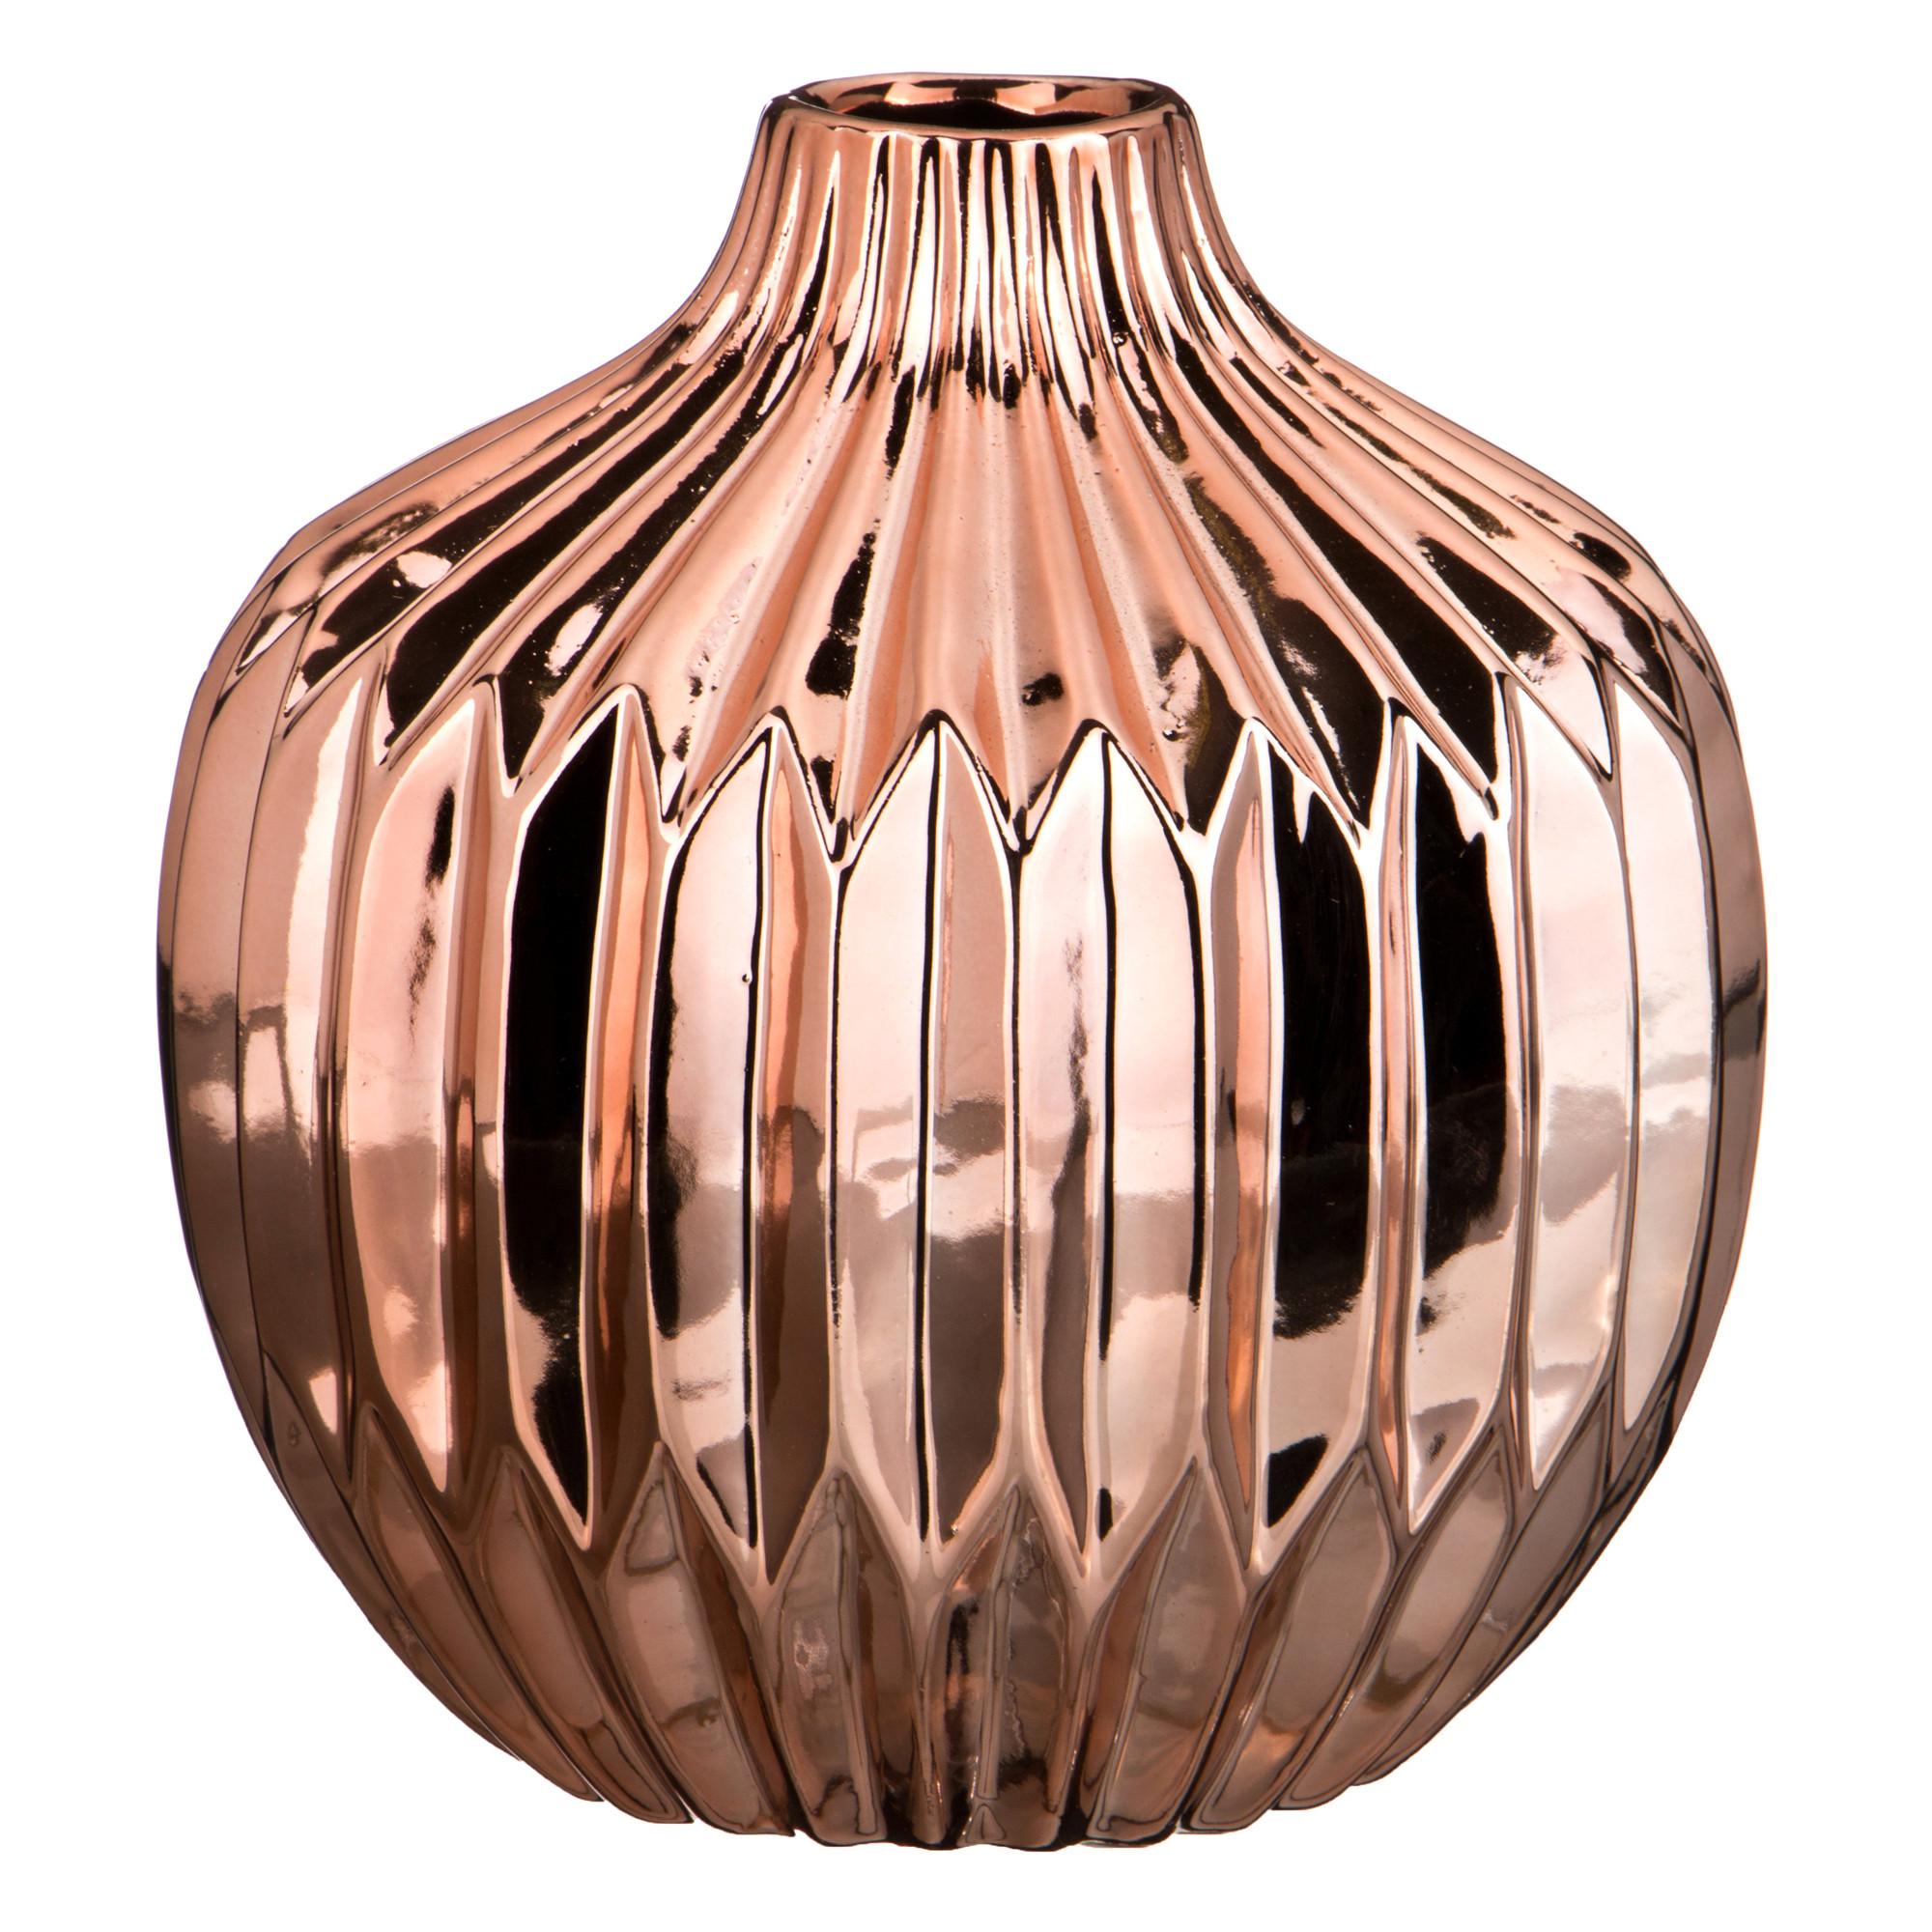 {} Lefard Ваза Шарм Цвет: Розовый (16х16х18 см) ваза керамика розовый рассвет 18 12 8 5 см 863622